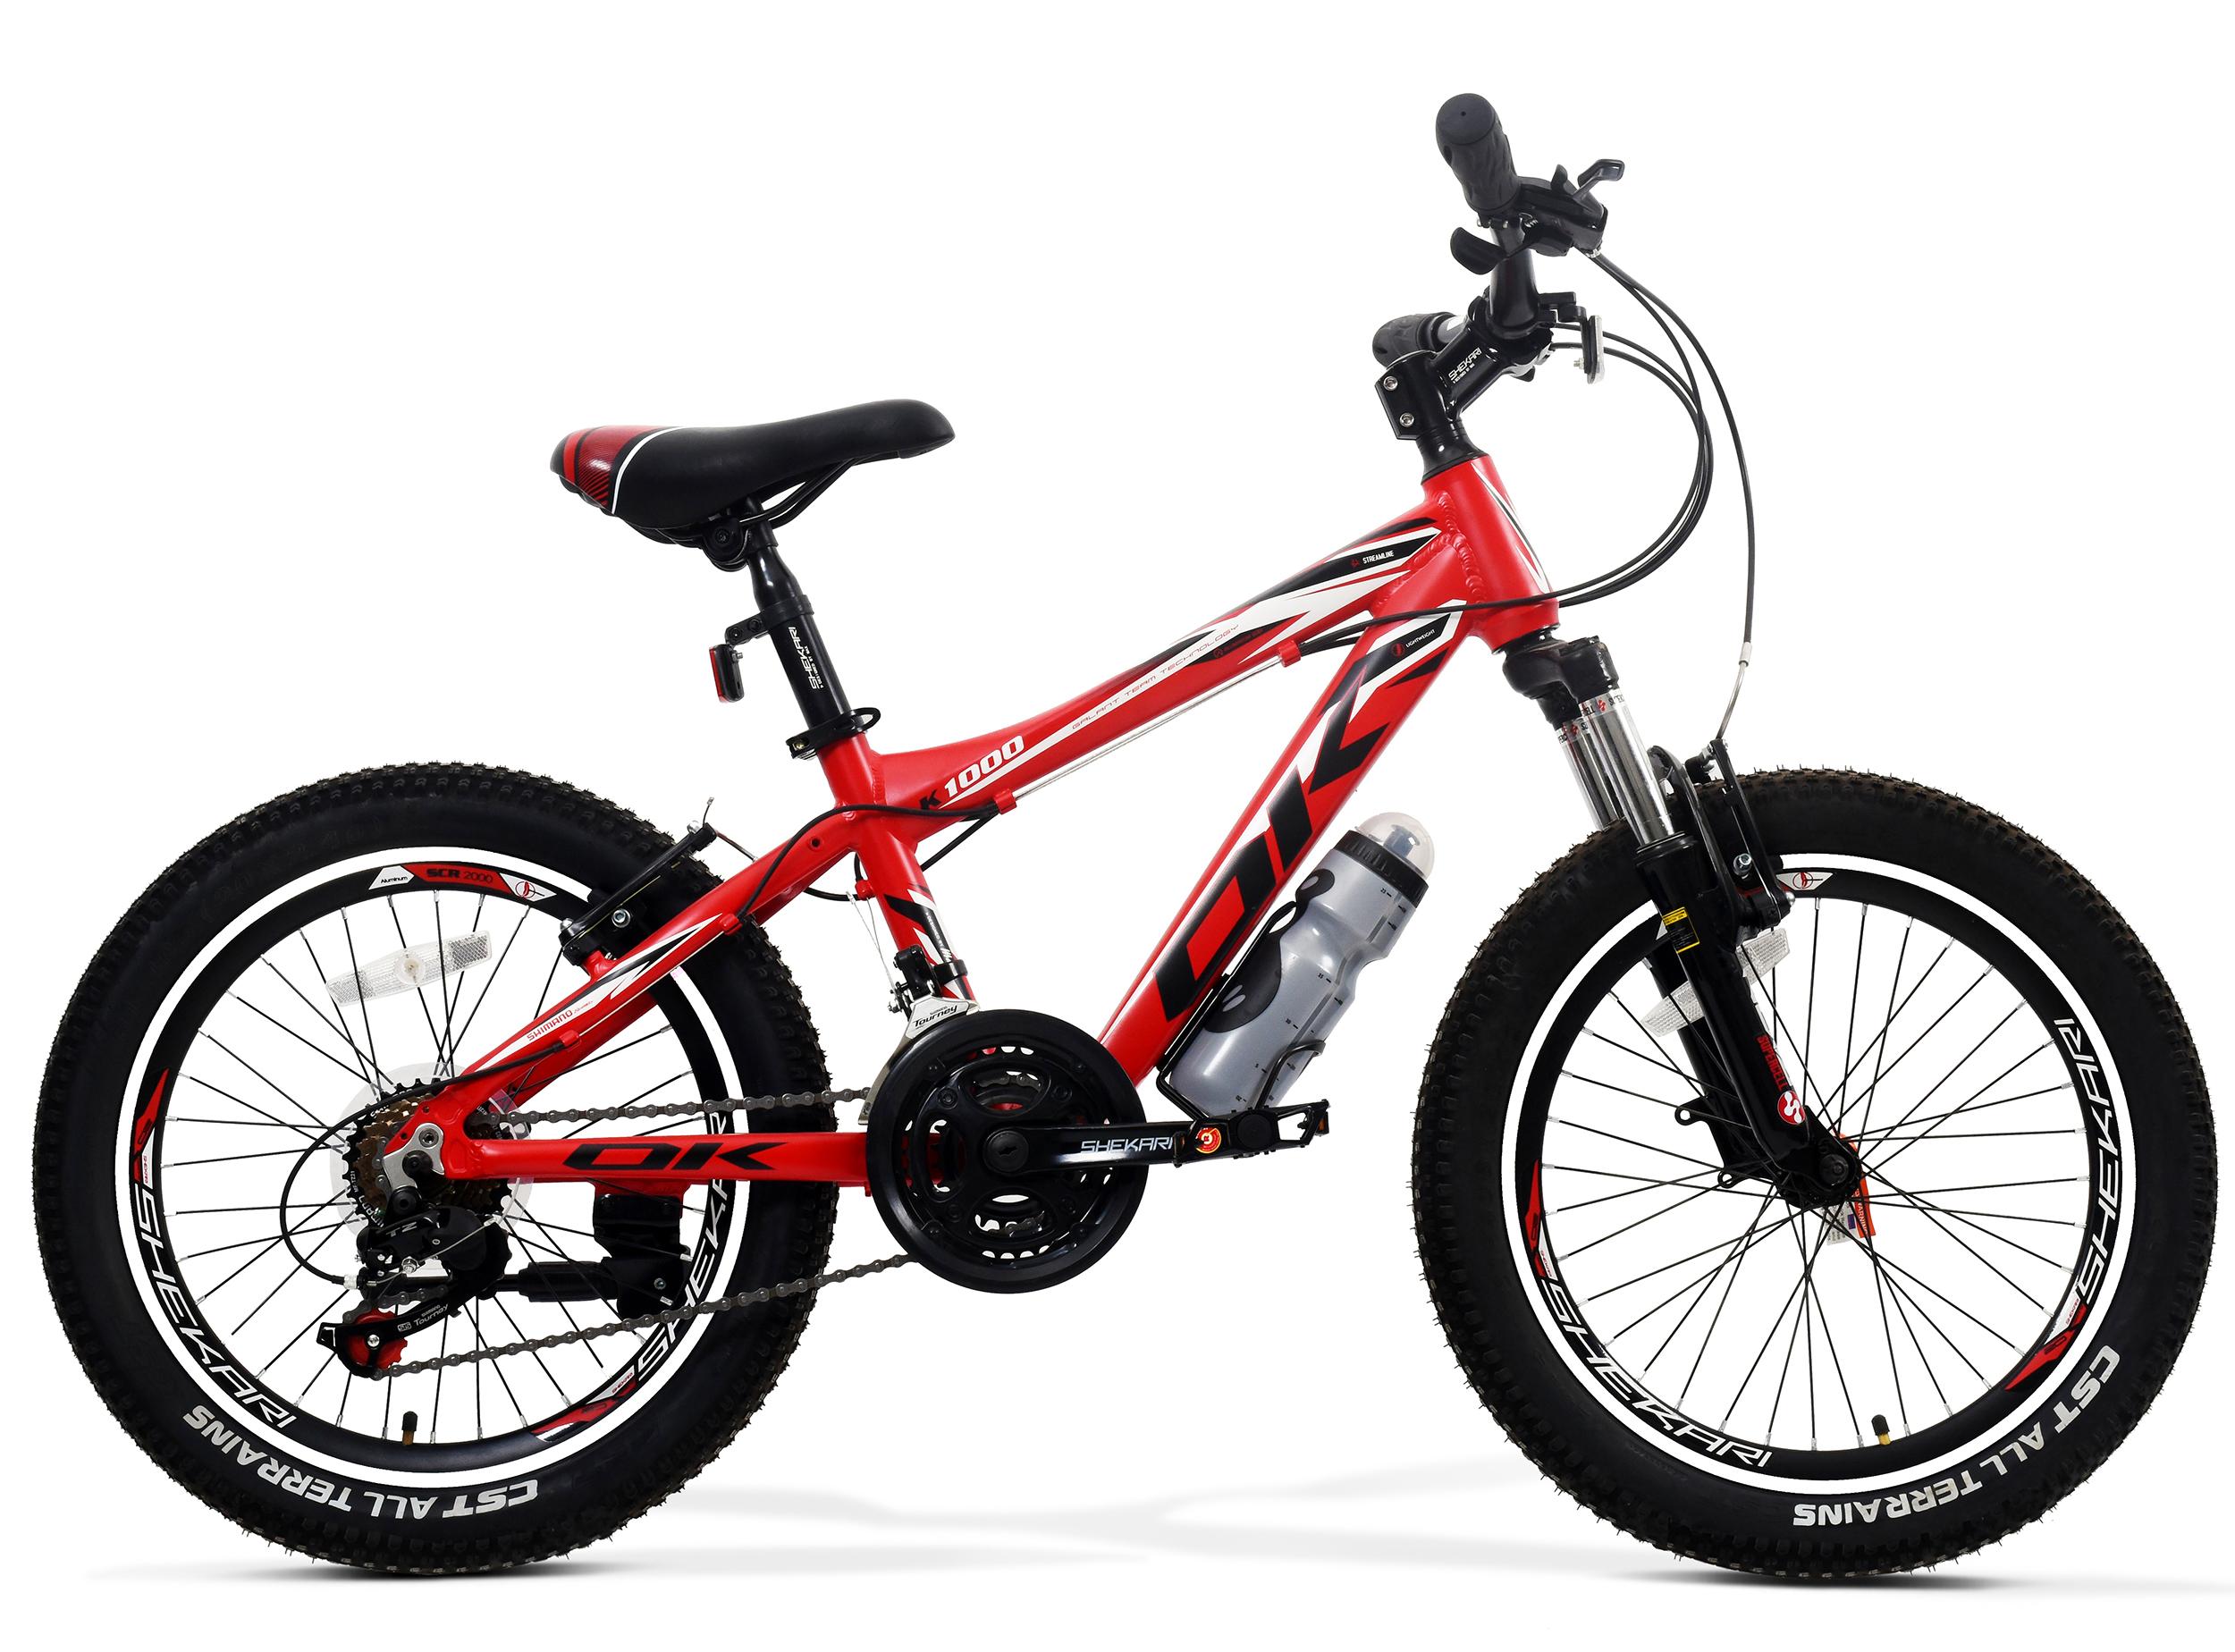 دوچرخه سایز 20 مدل K20004HR